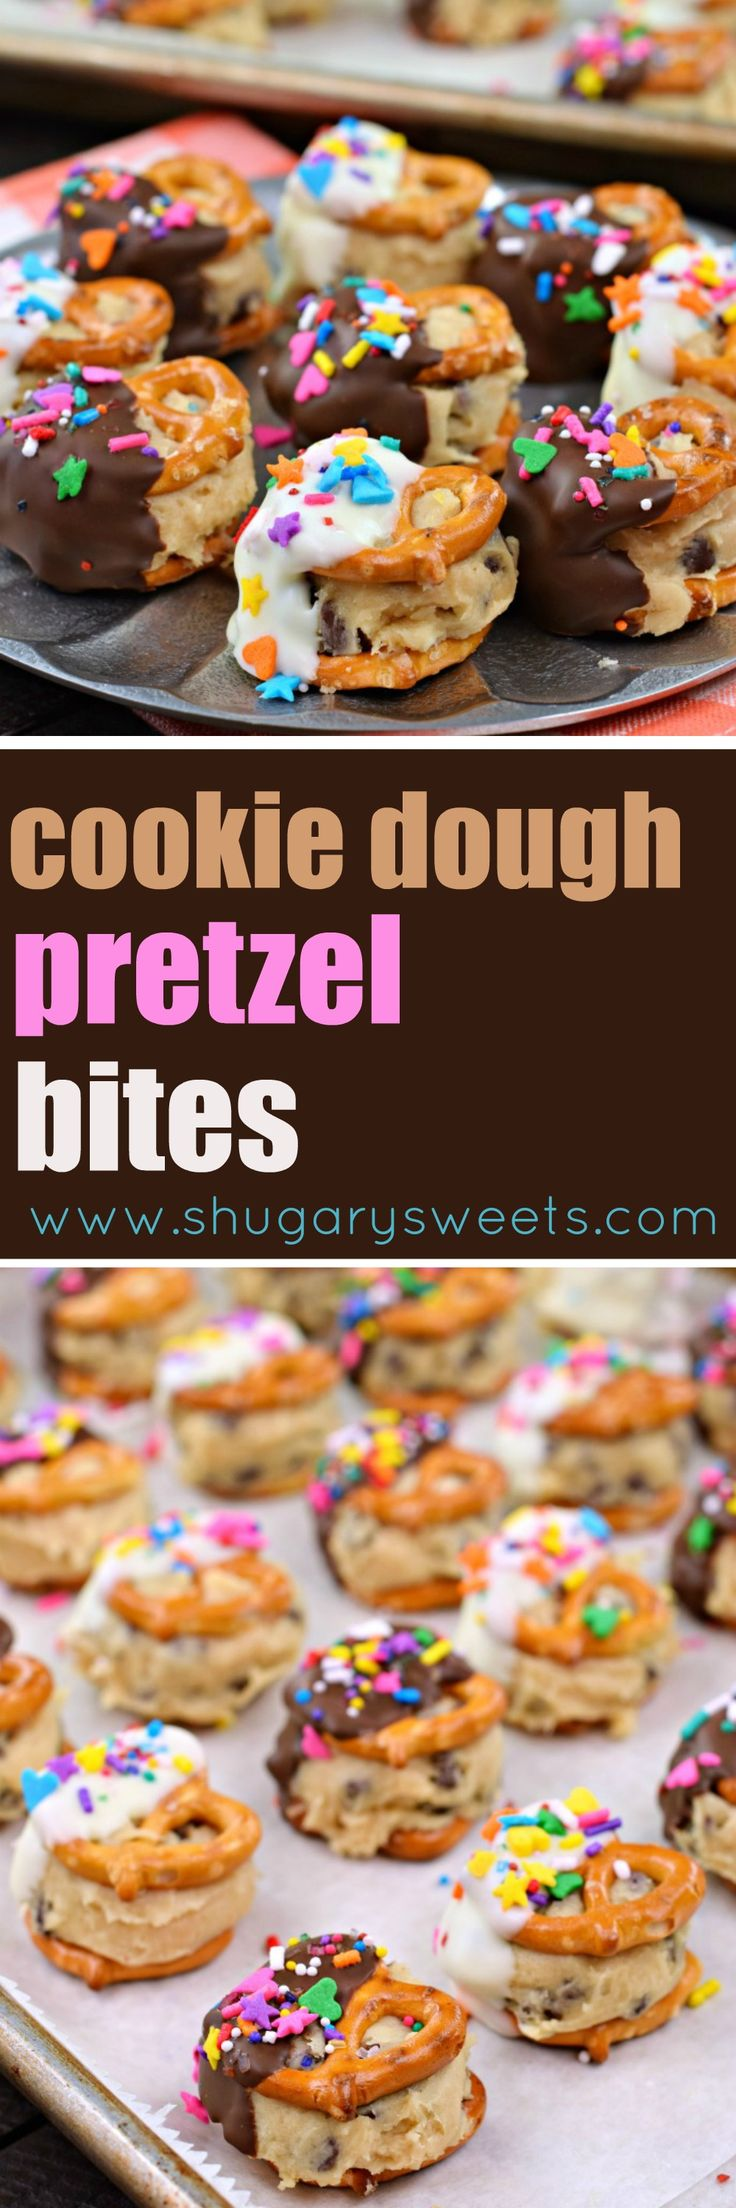 Chocolate Chip Cookie Dough Pretzel Bites #nobake #cookiedough #candy #chocolatechip #dessertrecipes